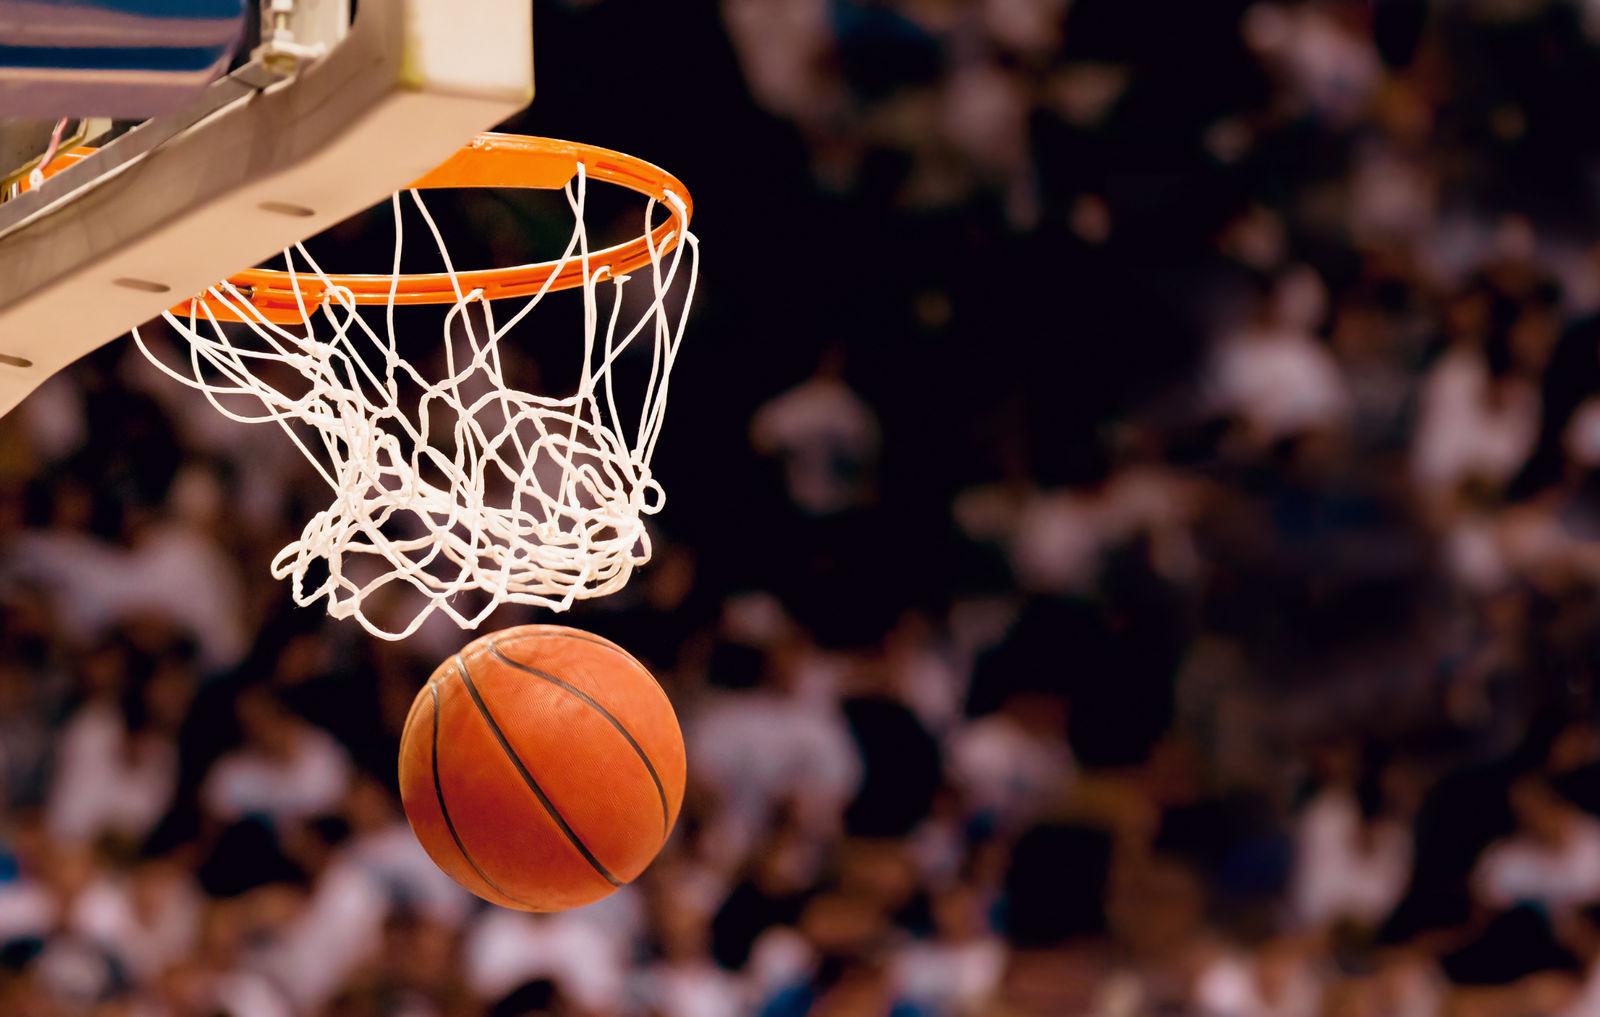 Watch Jordan Lawley's MVP performance at the Nike Summer game!